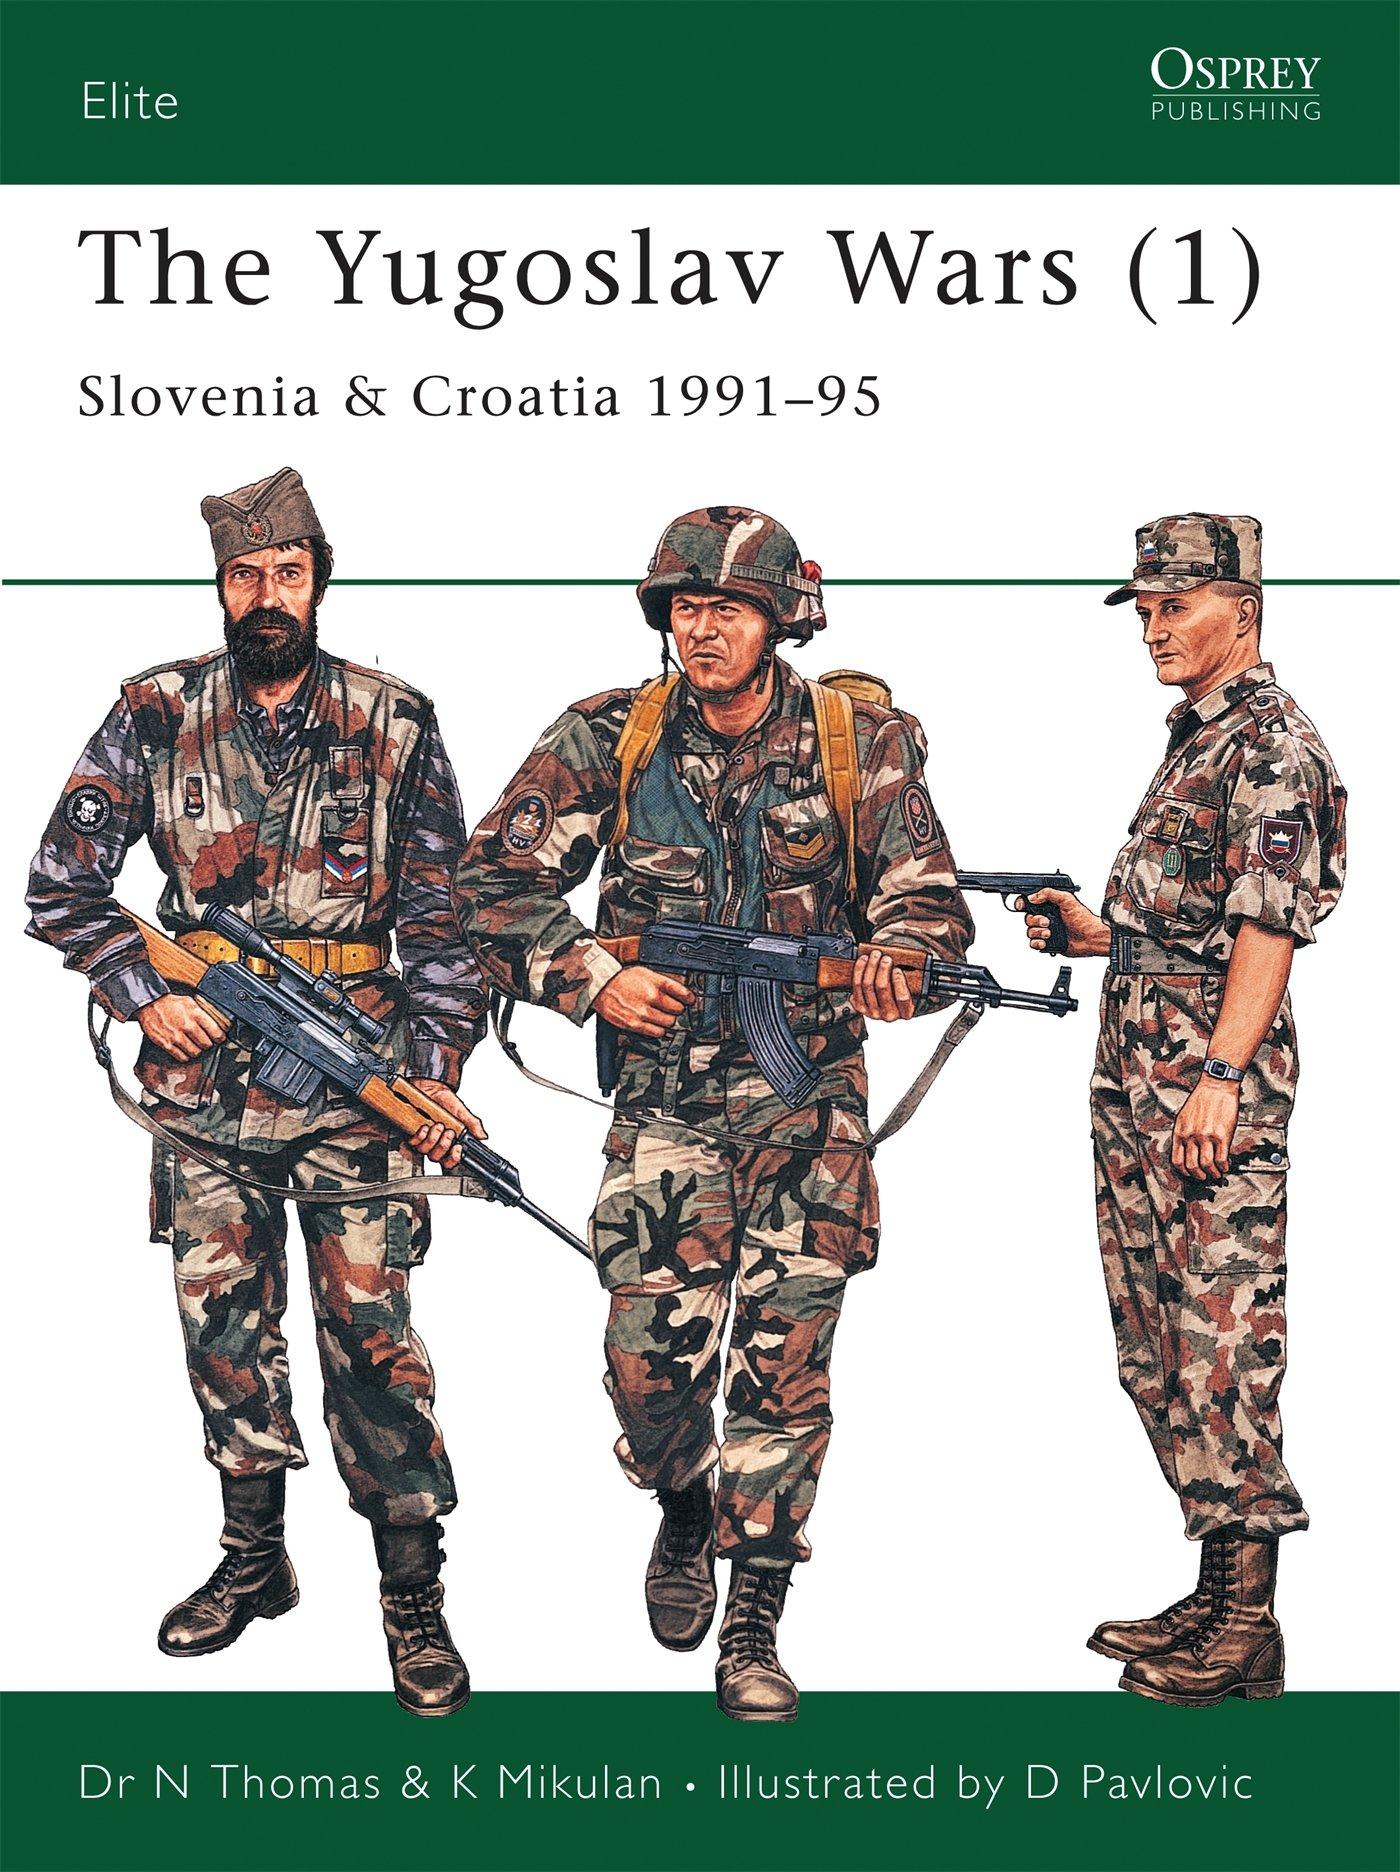 The Yugoslav Wars 1 : Slovenia & Croatia 1991-95: Slovenia and Croatia 1991-95: Vol 1 Elite: Amazon.co.uk: K Mikulan, Nigel Thomas, Darko Pavlovic: Books